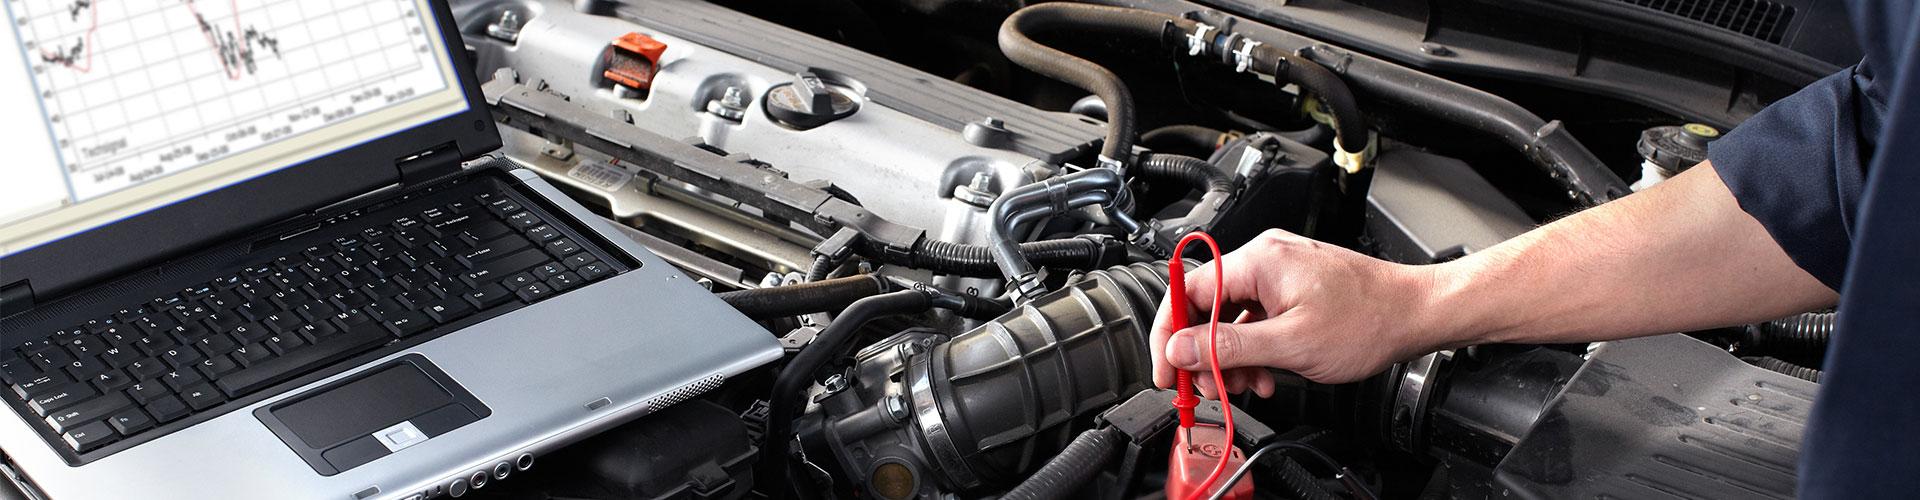 Diagnostics check on engine